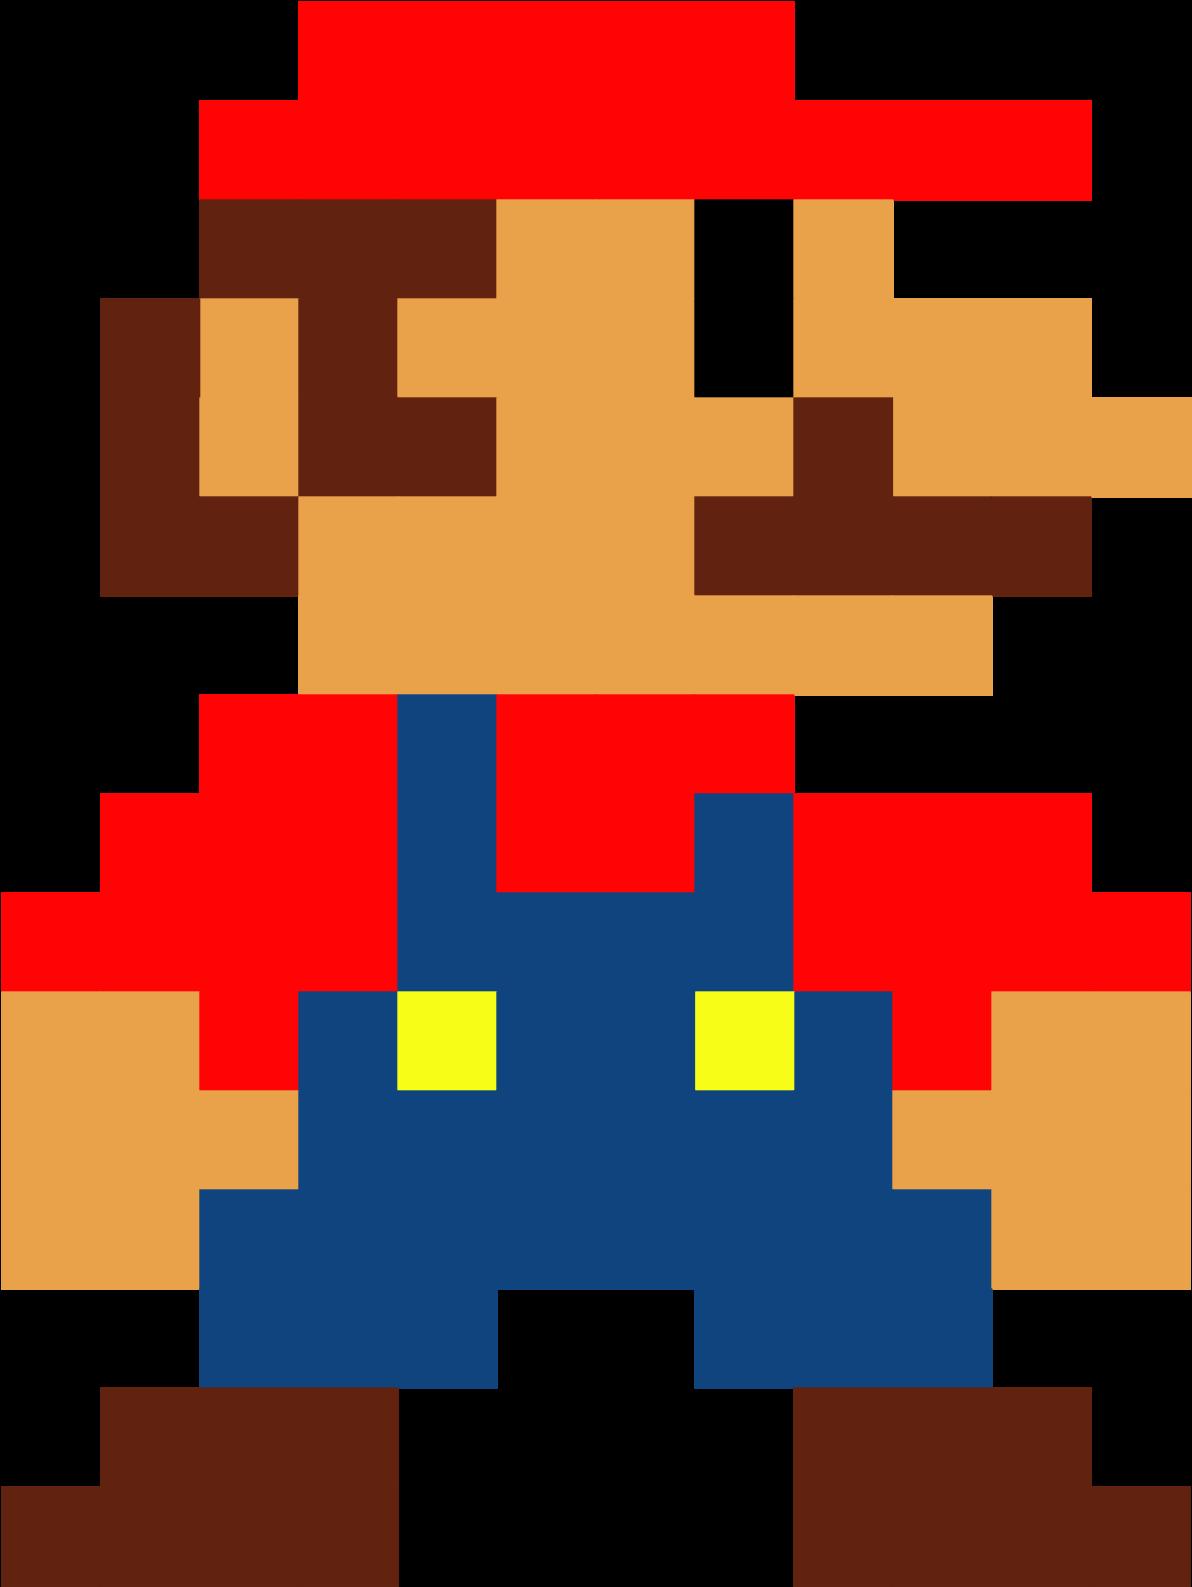 Pipe Clipart Pixel Art Mario Bros 64 Bits Png Download